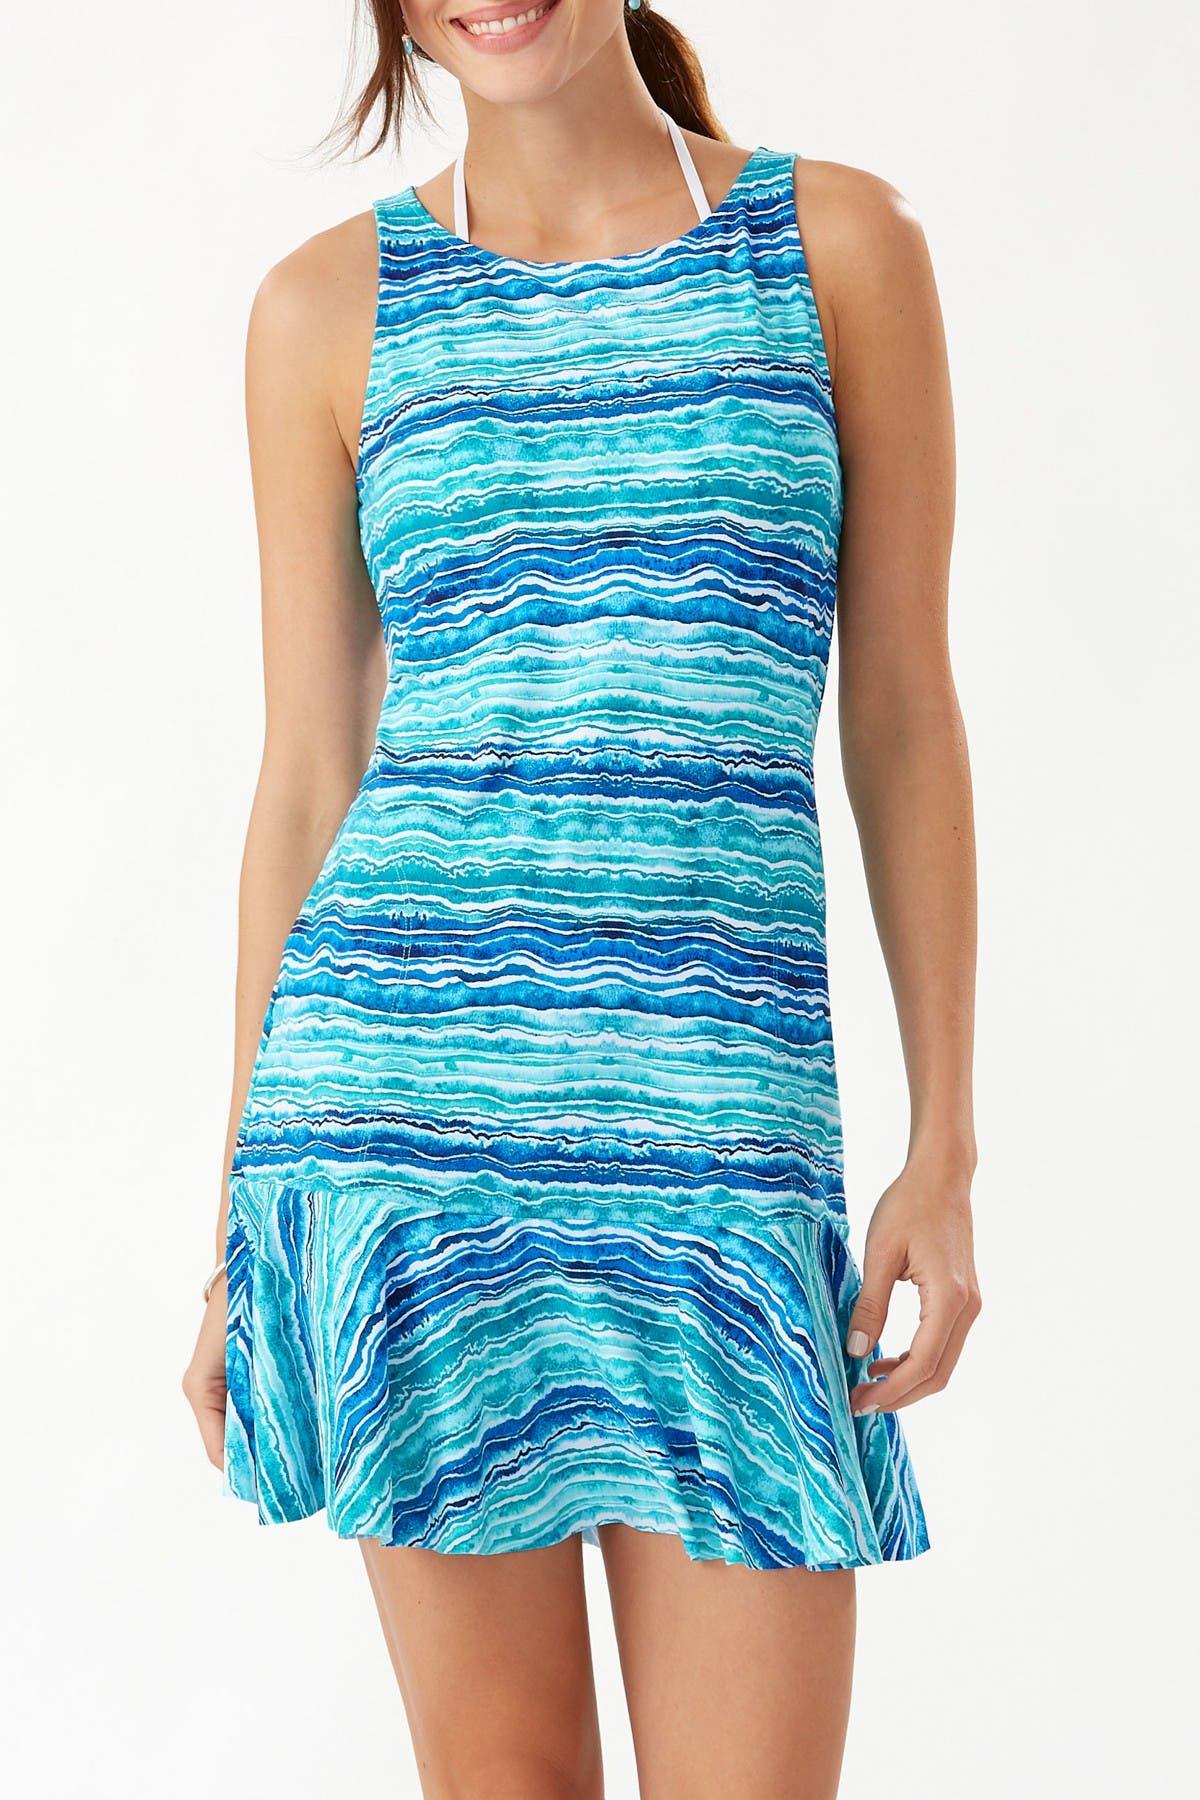 Image of Tommy Bahama Rainbow High Neck Spa Dress